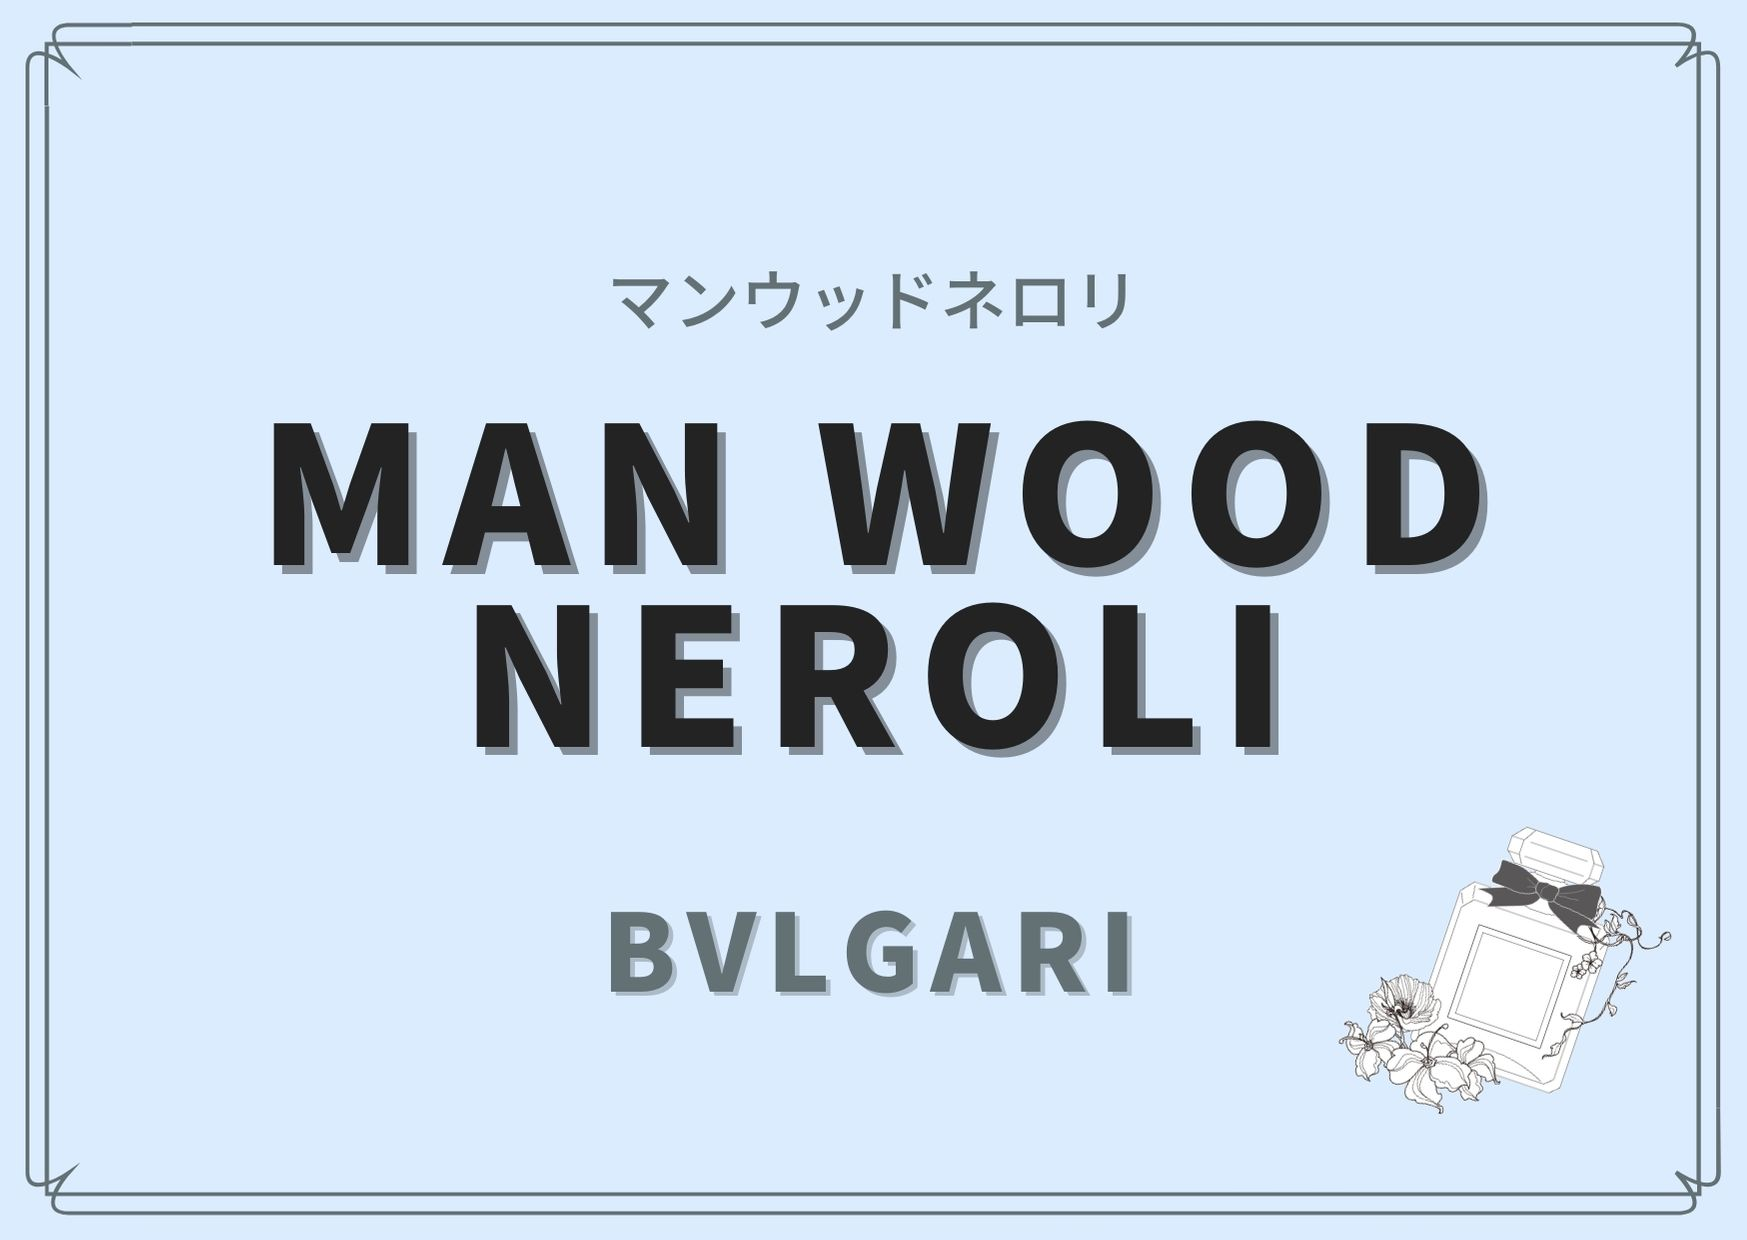 Man Wood Neroli(マンウッドネロリ)/ BVLGARI(ブルガリ)